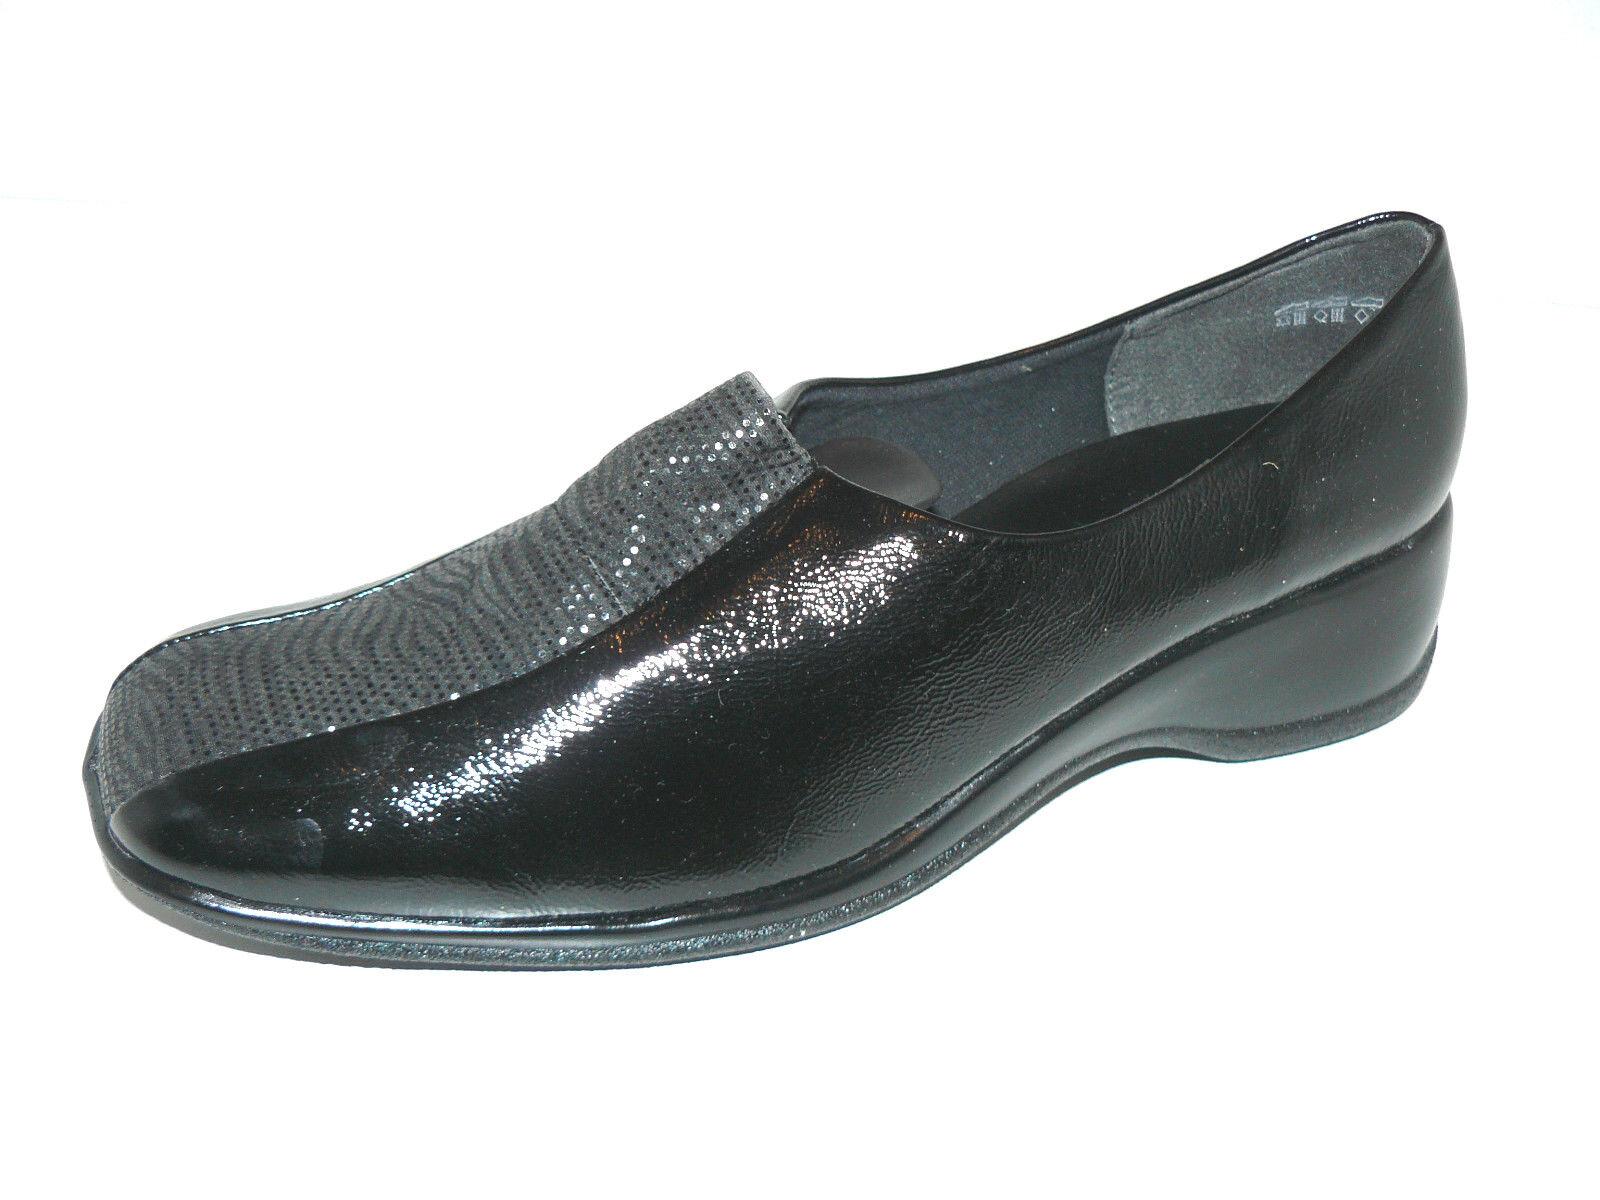 BLEIL schwarze Lack Slipper Halb Schuhe 44 UK 9,5 Leder elegant Pumps weich NEU